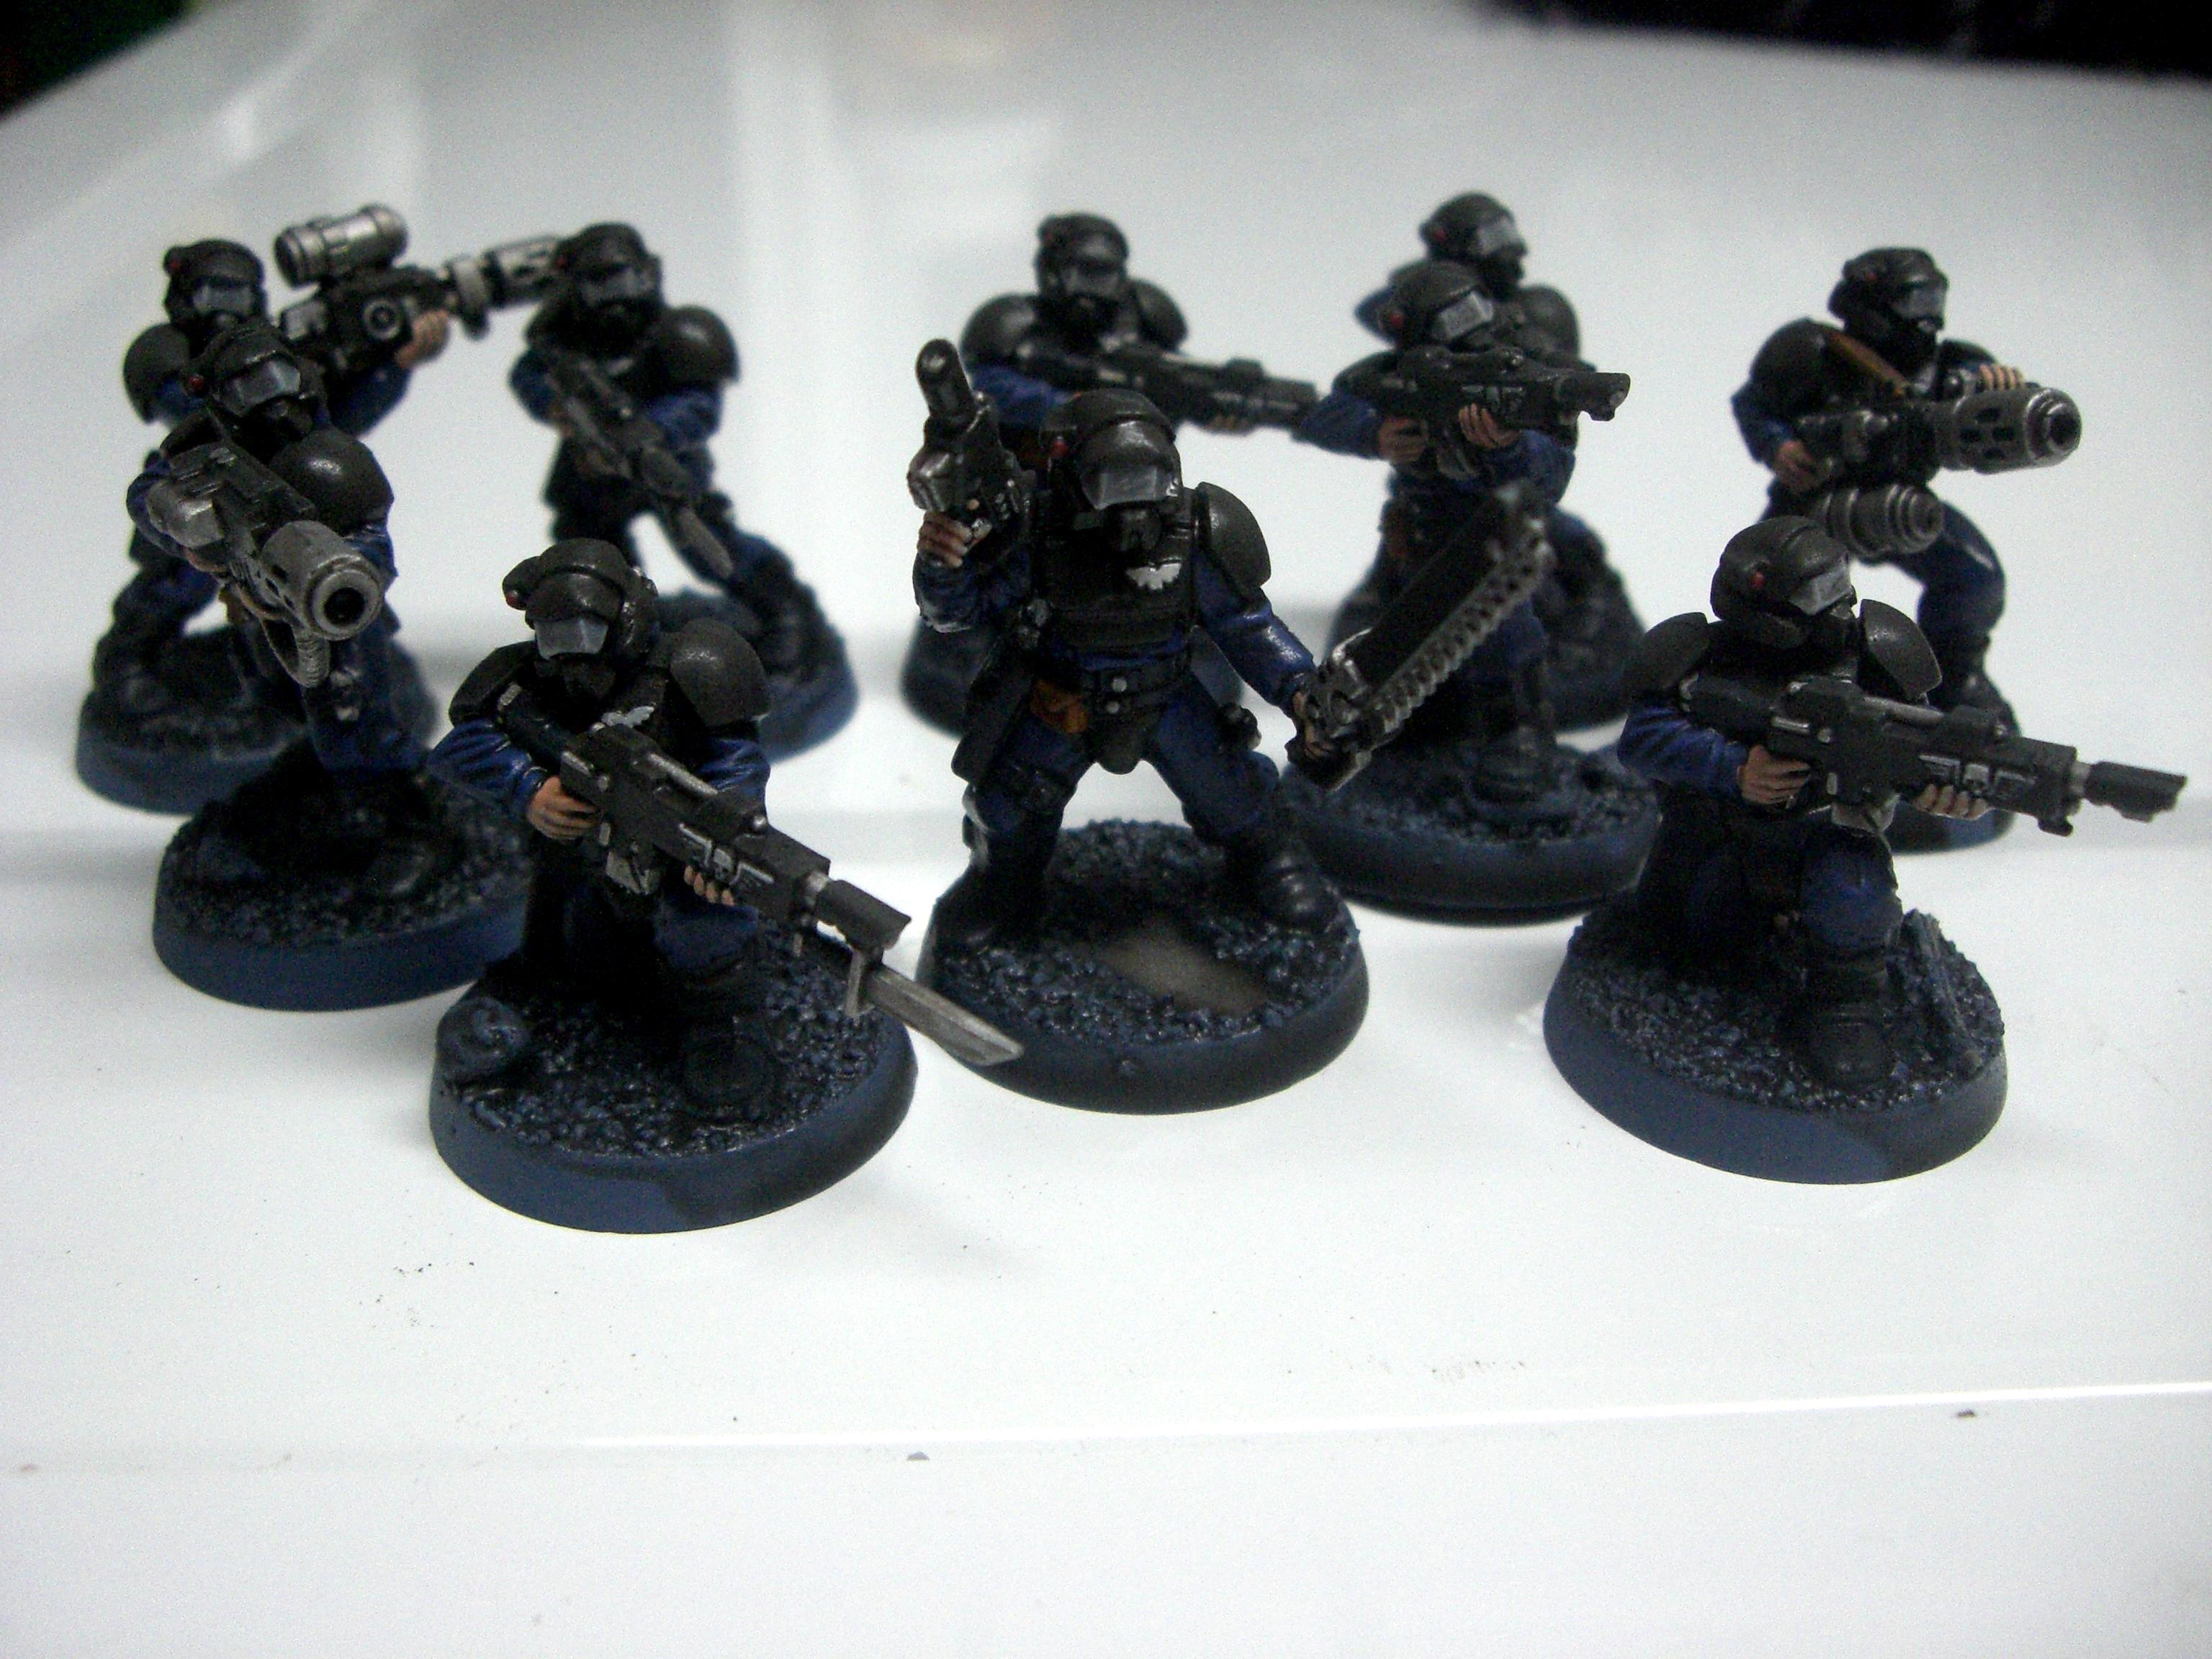 Conversion, Halo, Imperial Guard, Meltagun, Penal Legion, Quickshade, The Army Painter, Veteran, Veteran Squad, Visor, Work In Progress